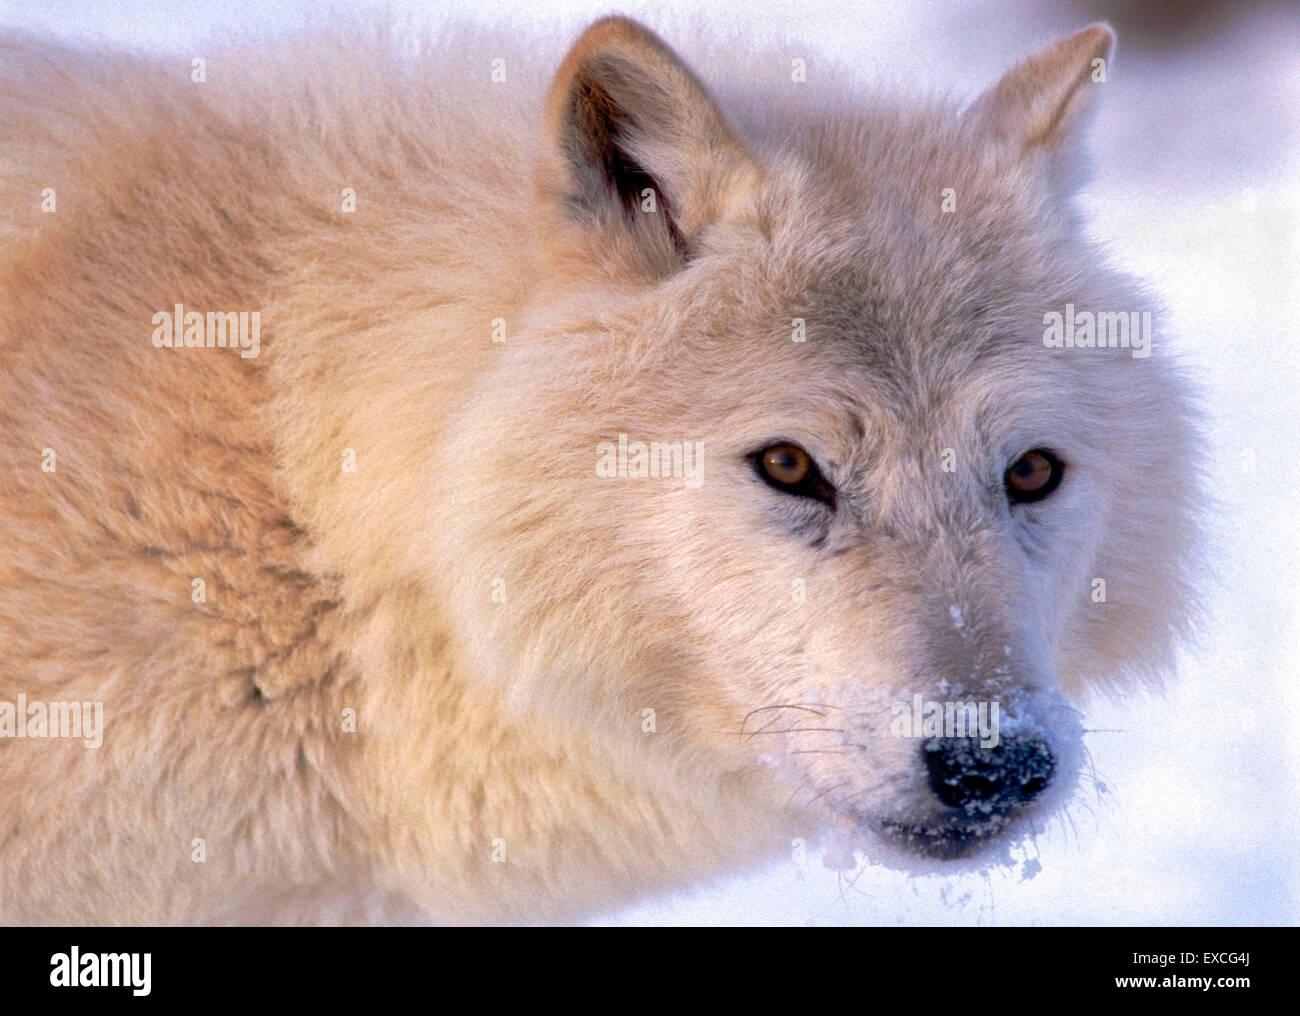 Arctic Wolf watching, portrait closeup - Stock Image